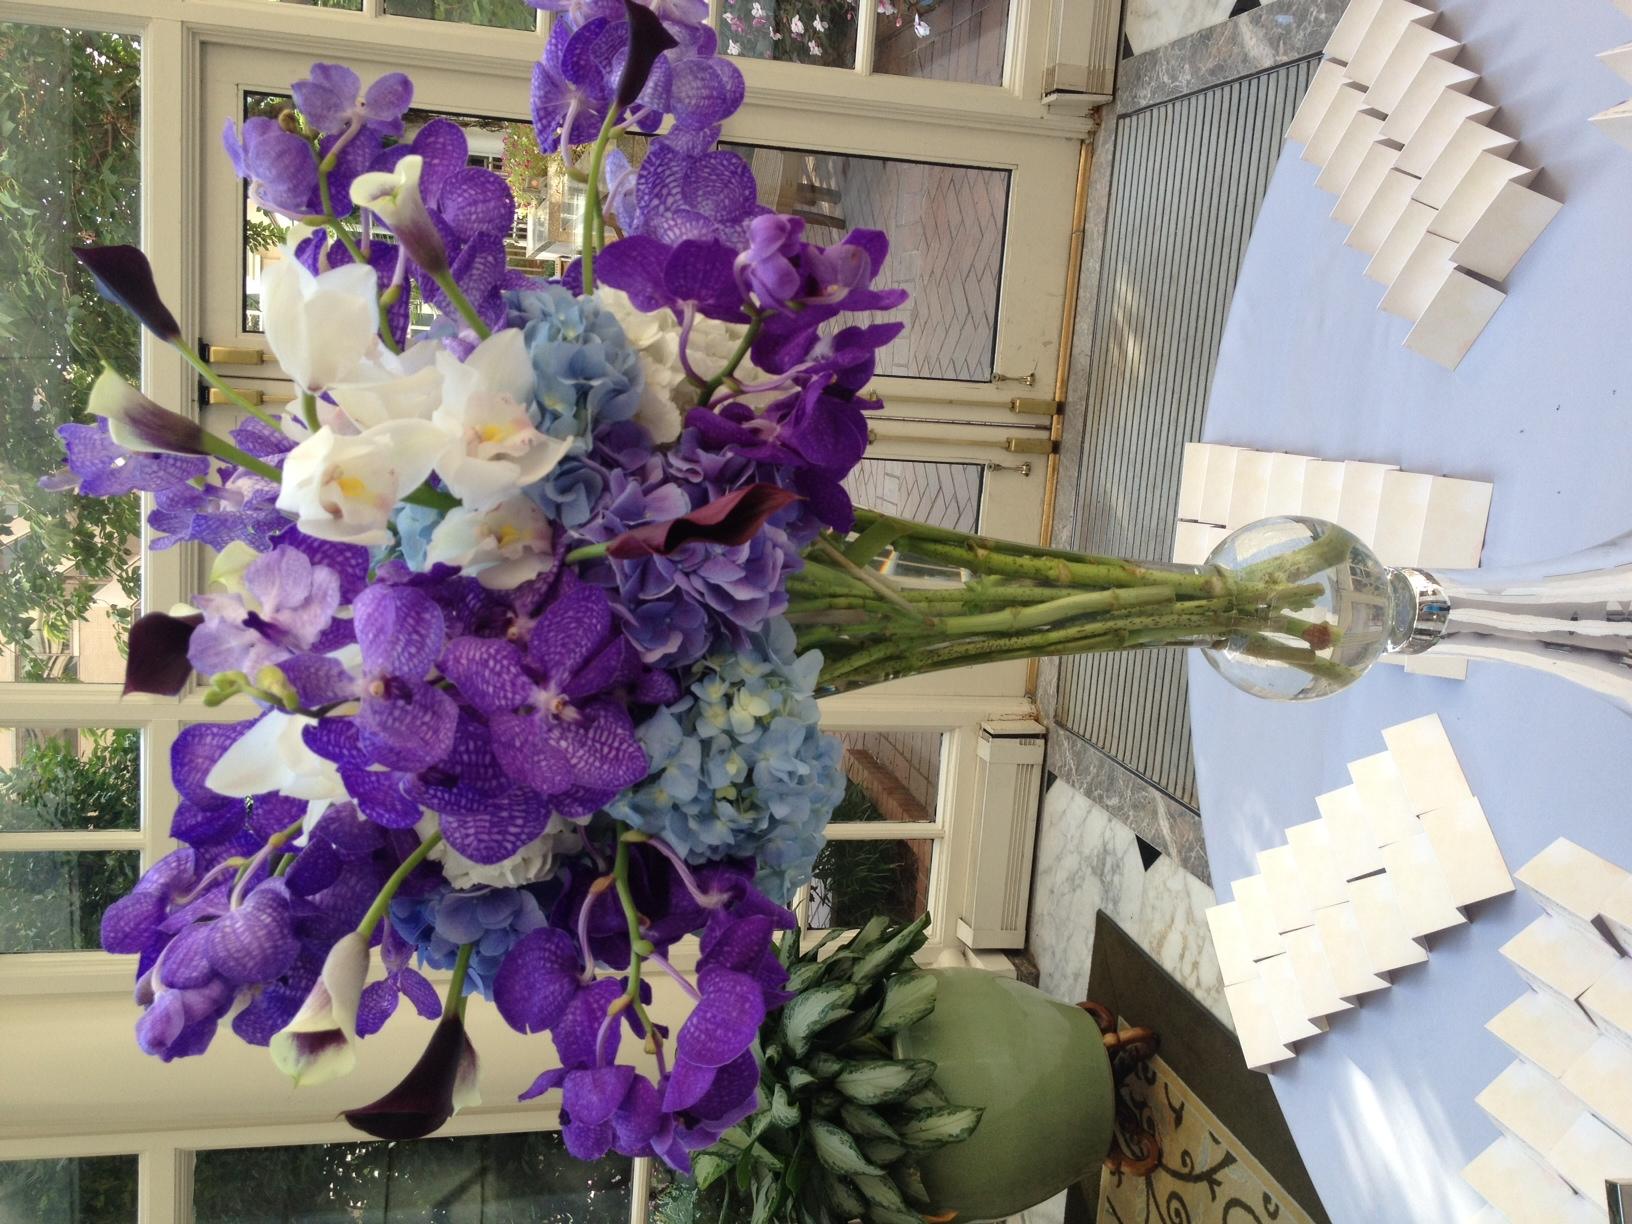 Purple Flower Arrangements 66 High Resolution Wallpaper ...